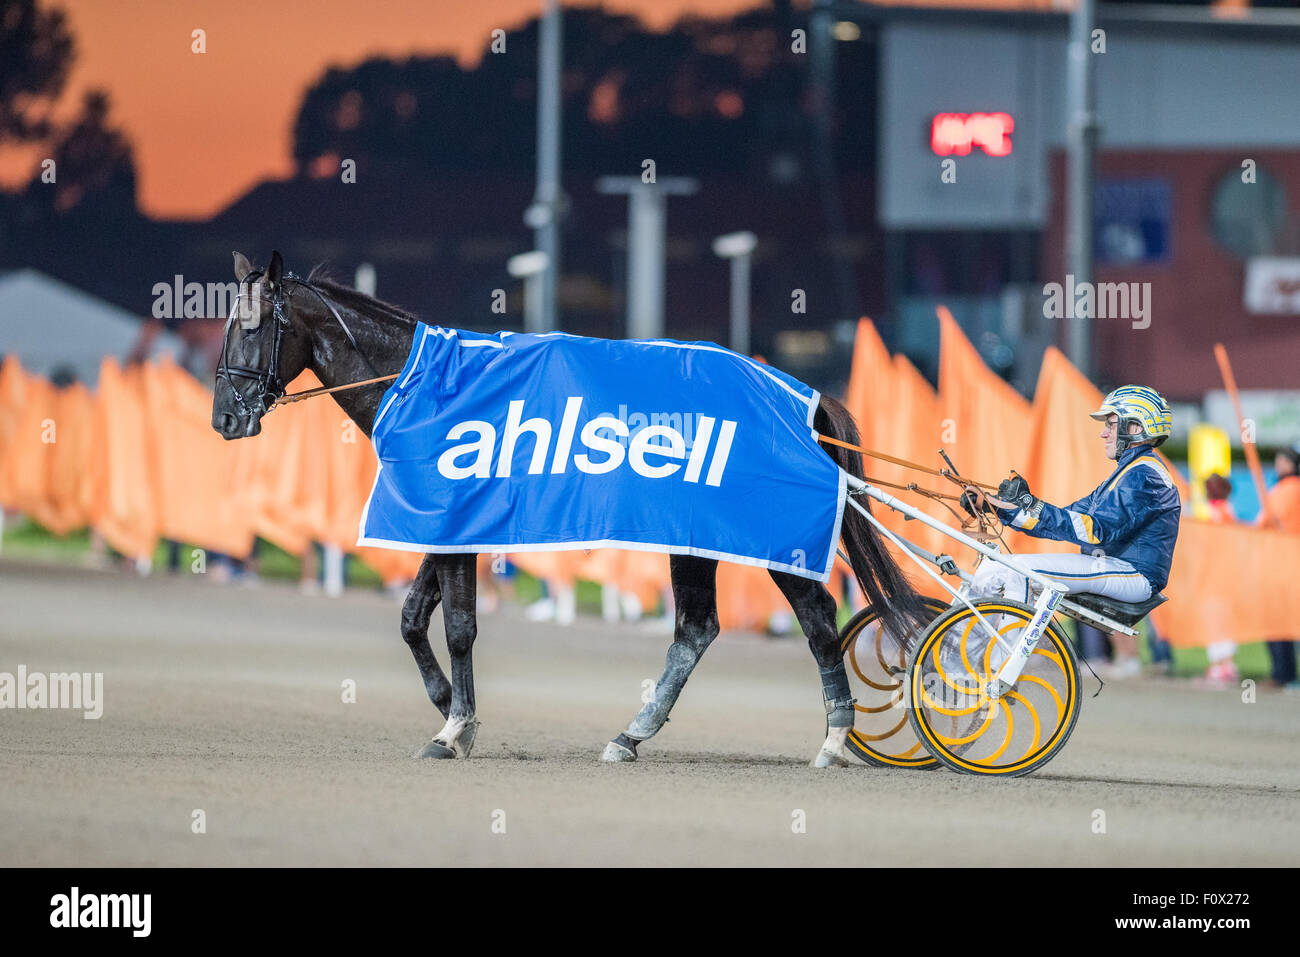 Stefan Melander behind Nuncio after winning V75 race #5 at Solvalla horse racing track on August 19, 2015 - Stock Image